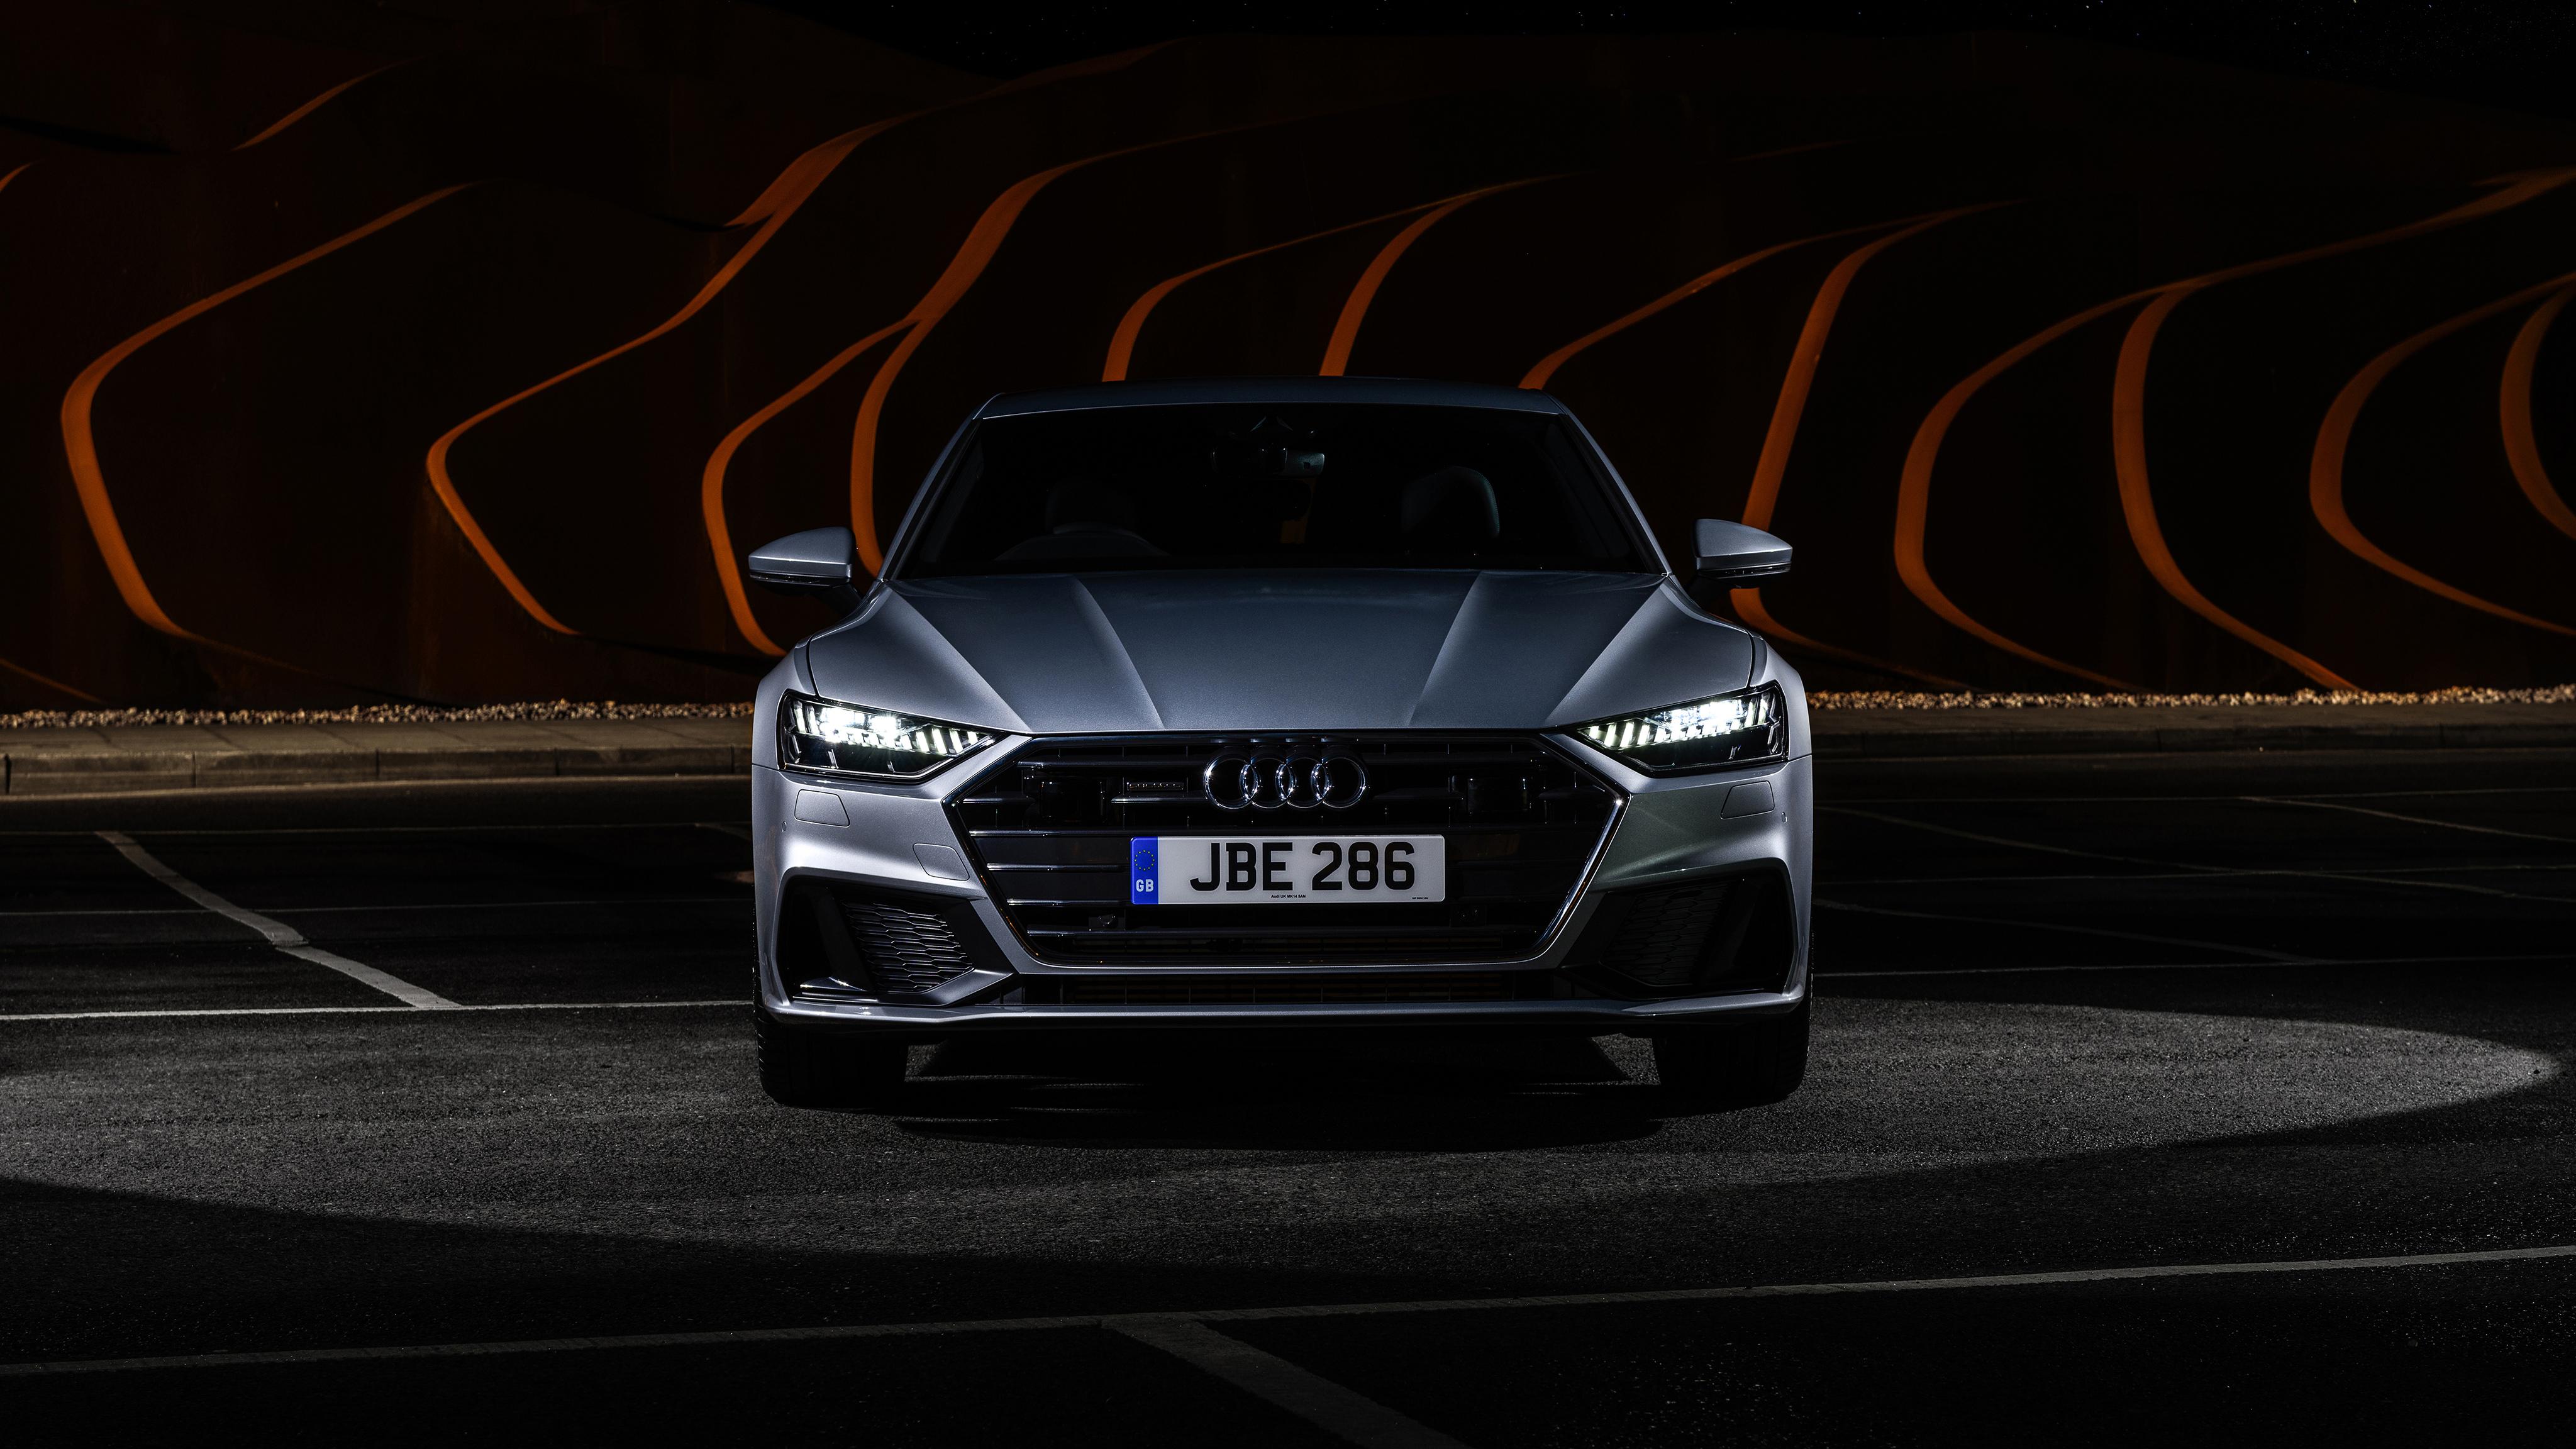 2018 Audi A7 Sportback 50 TDI quattro S Line 4K 3 ...